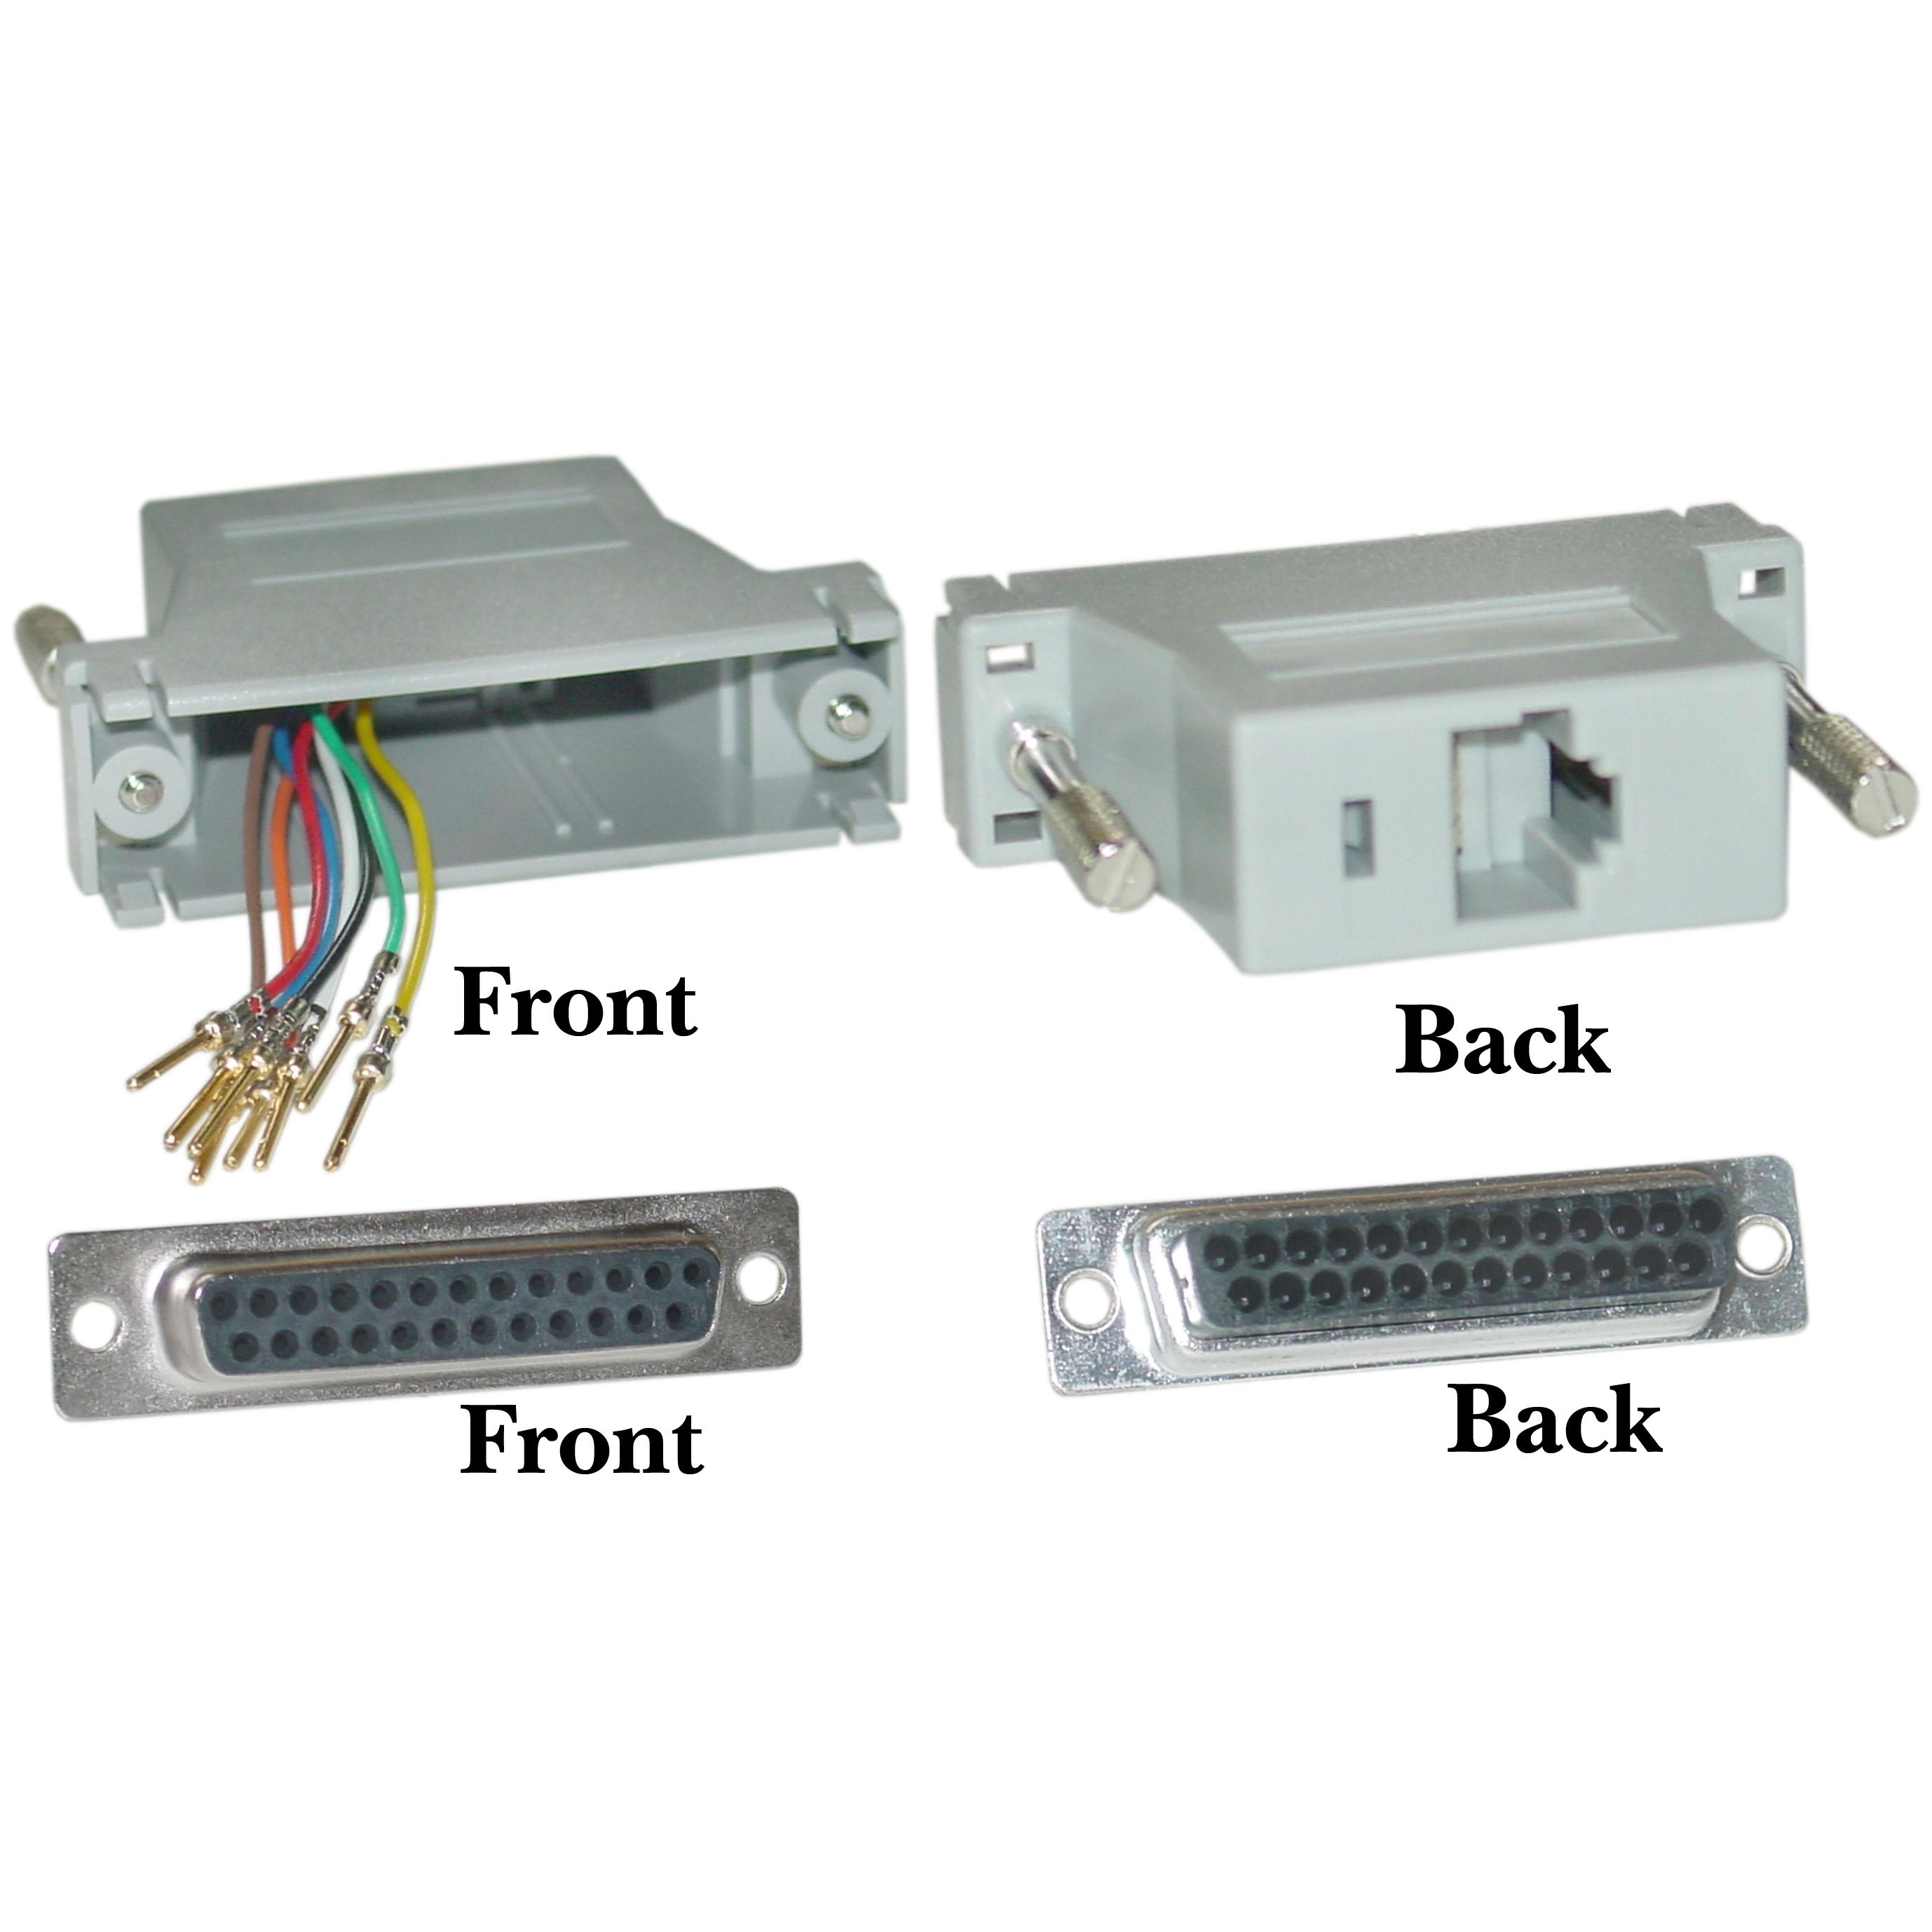 EDD3545 Rj45 To Db25 Wiring Diagram | Wiring Resources on